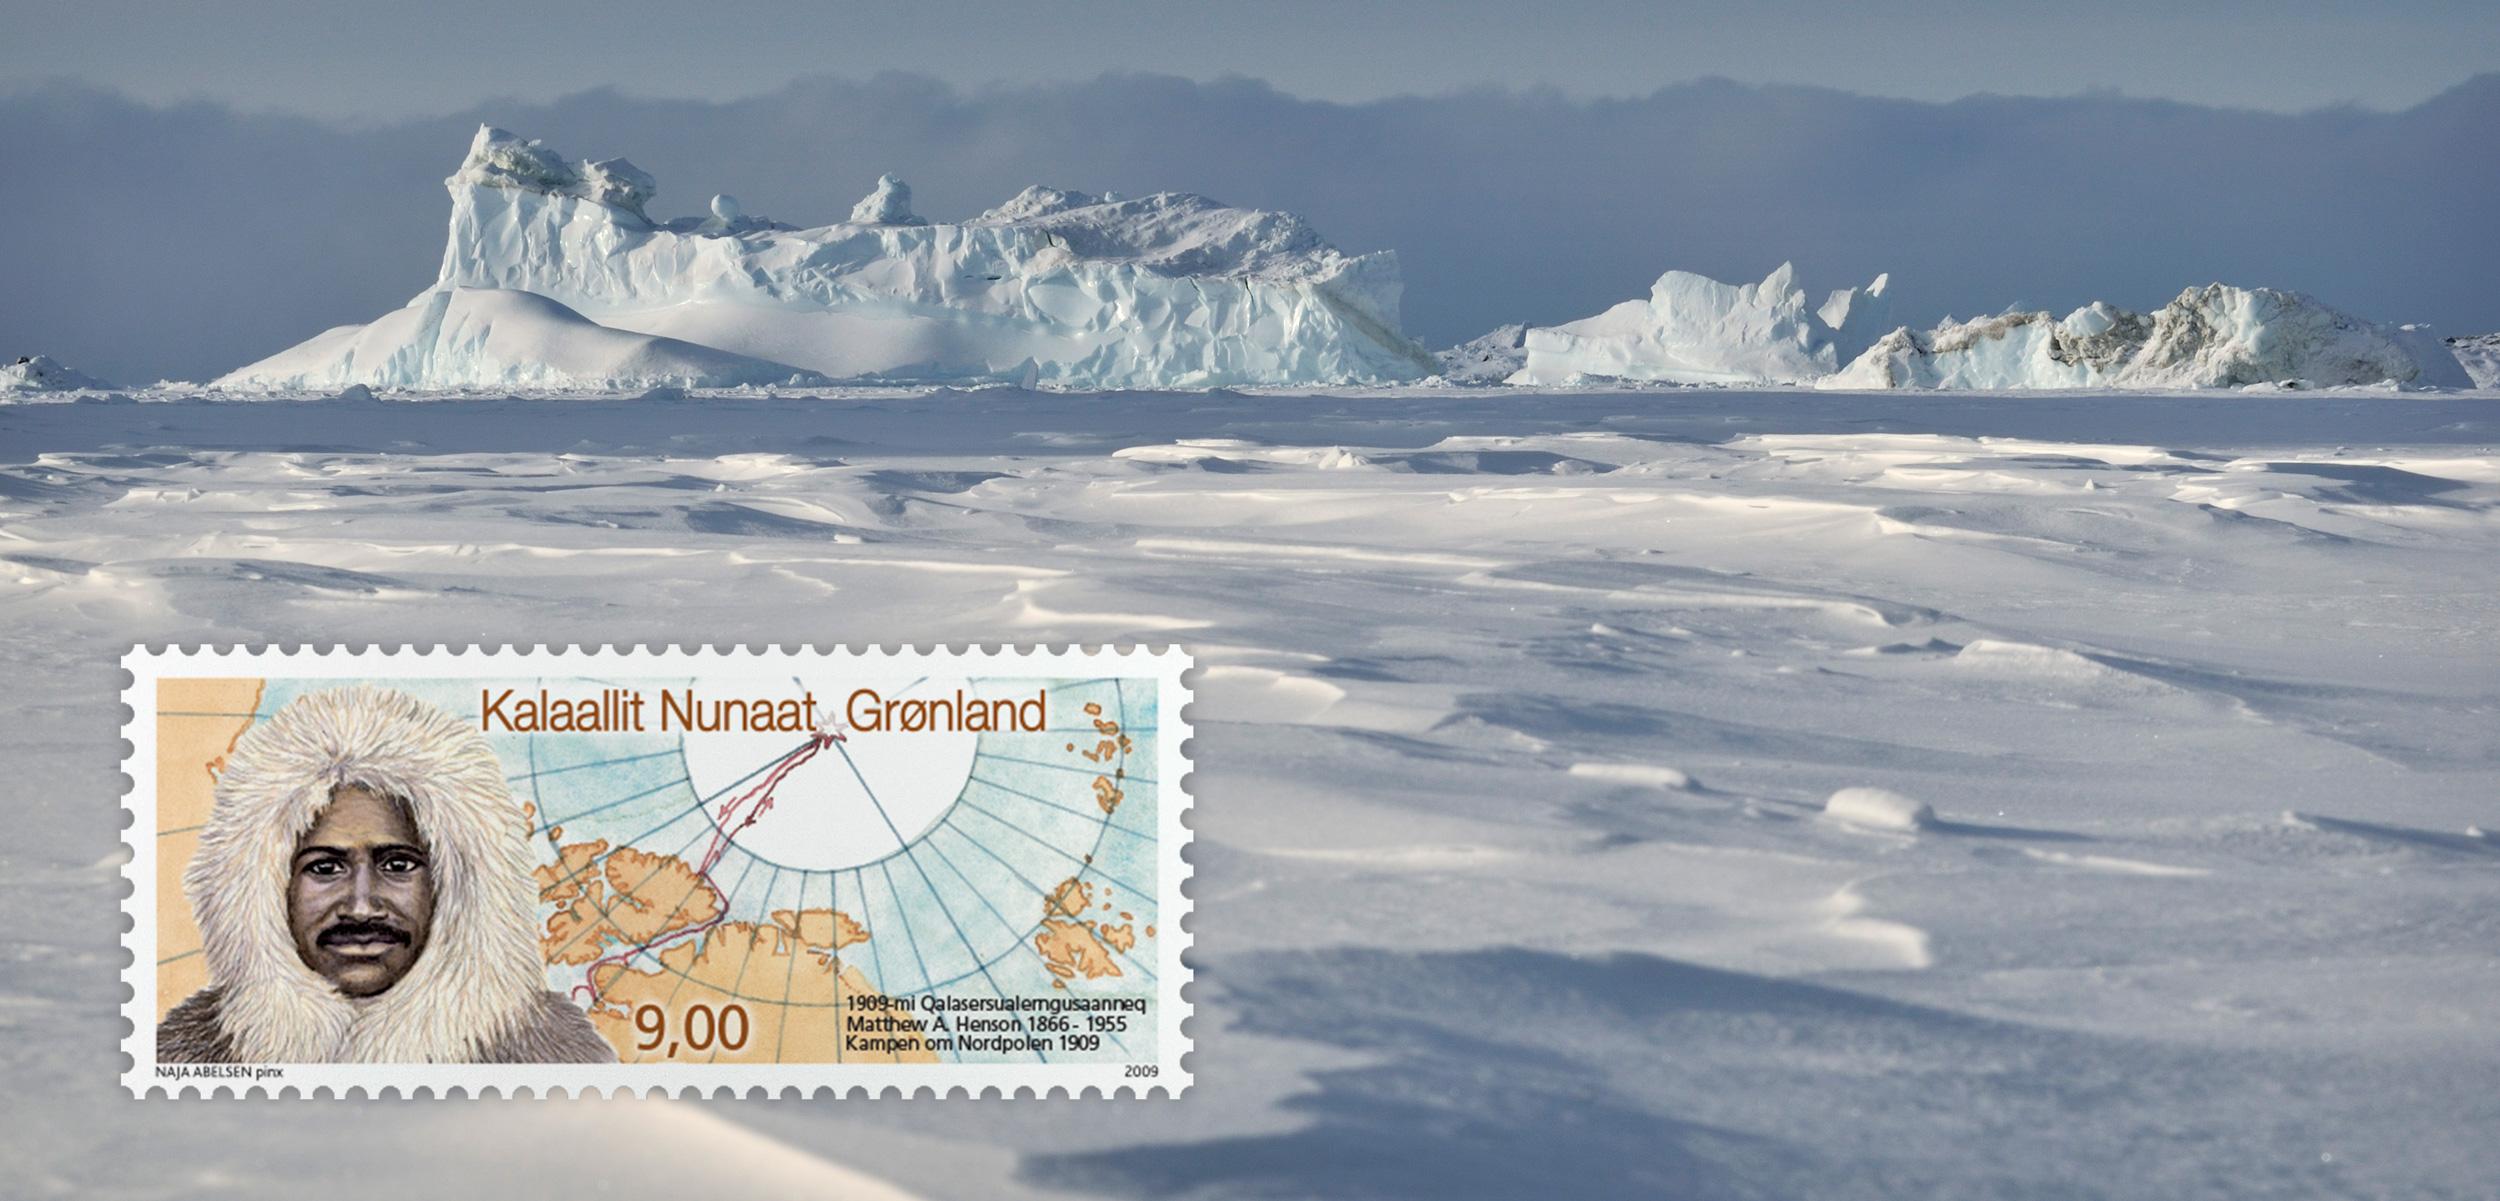 Matthew Henson North Pole